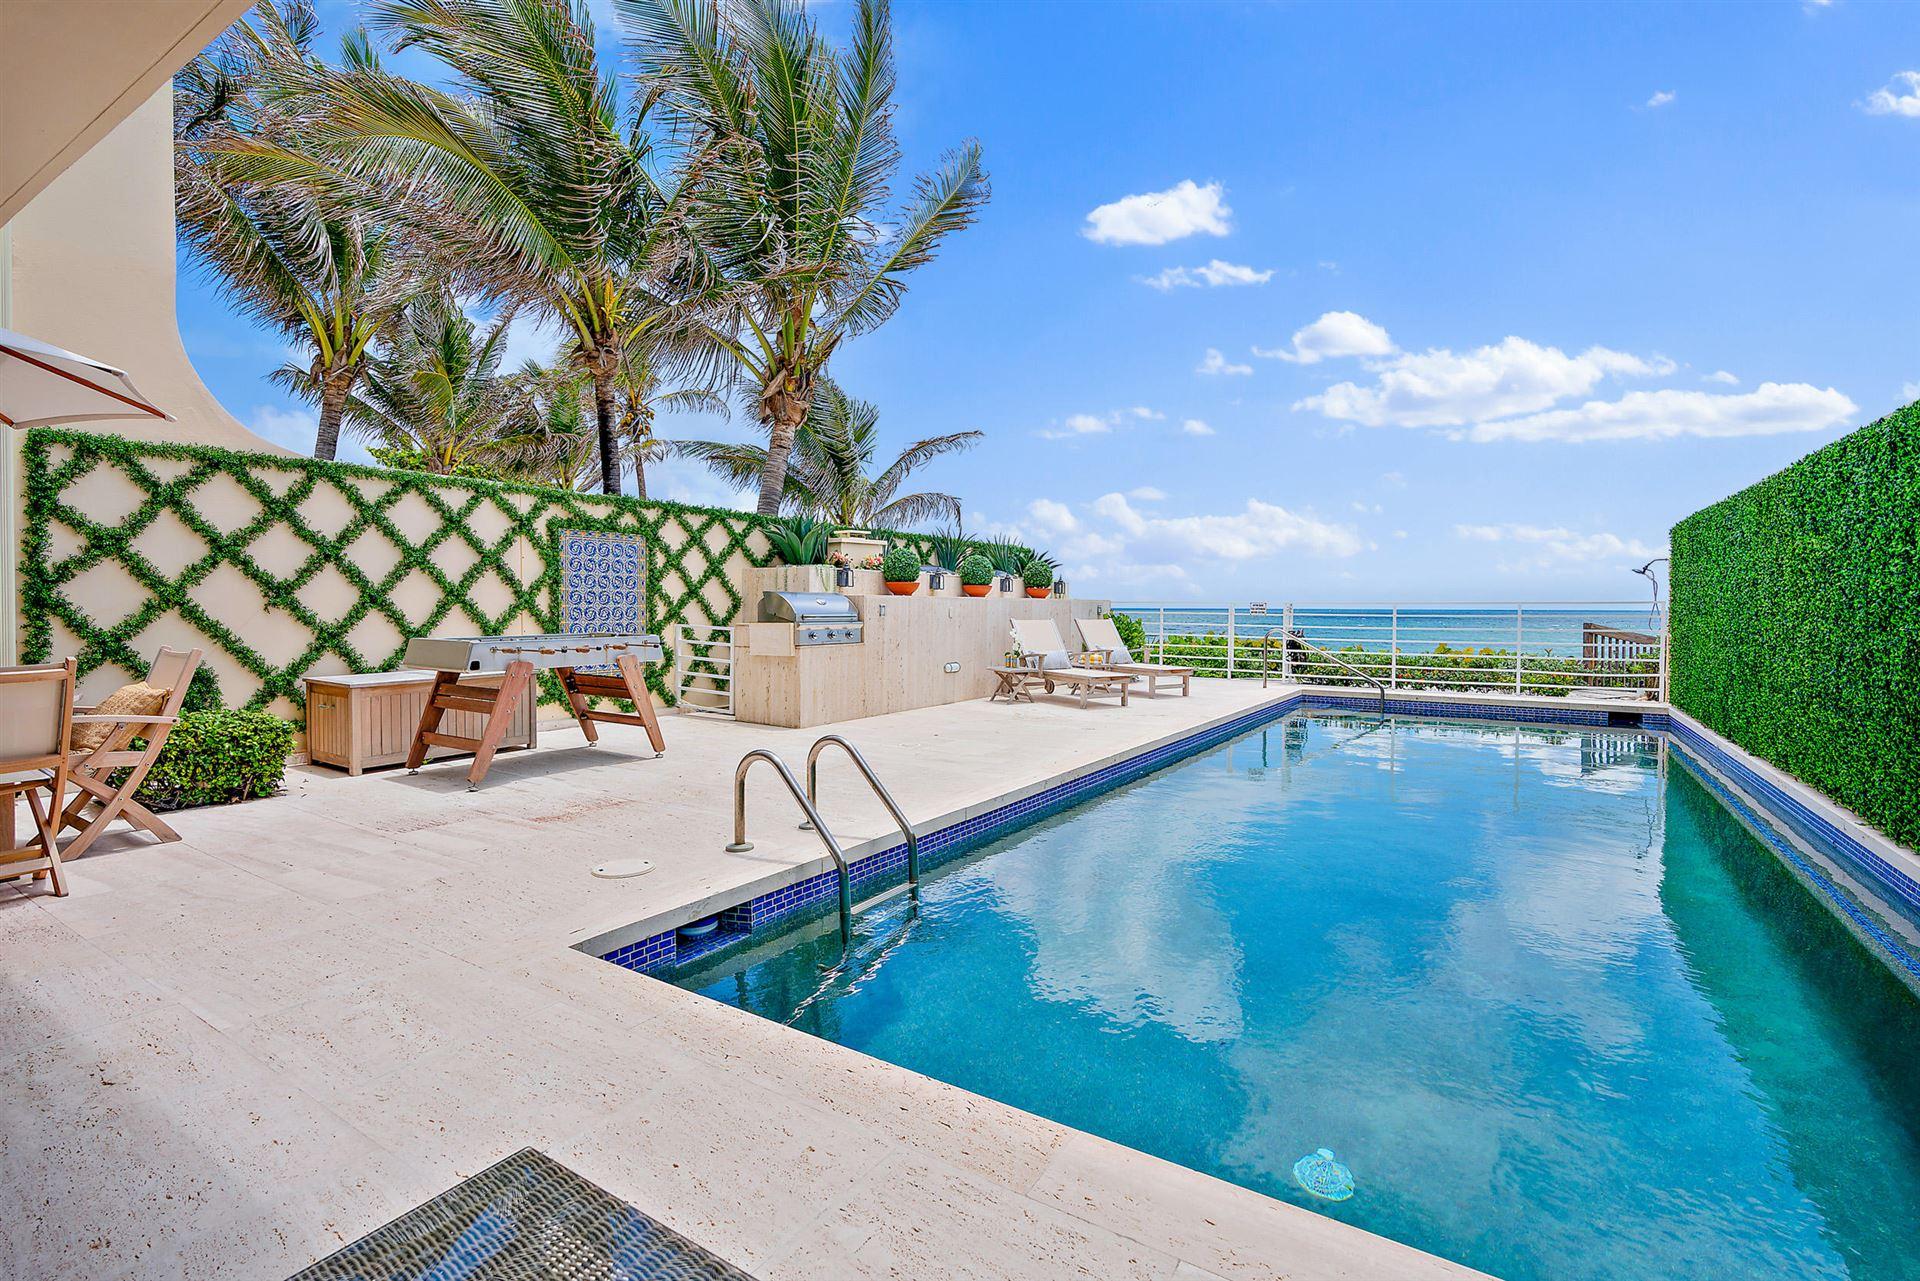 12 Sloans Curve Drive, Palm Beach, FL 33480 - #: RX-10627867